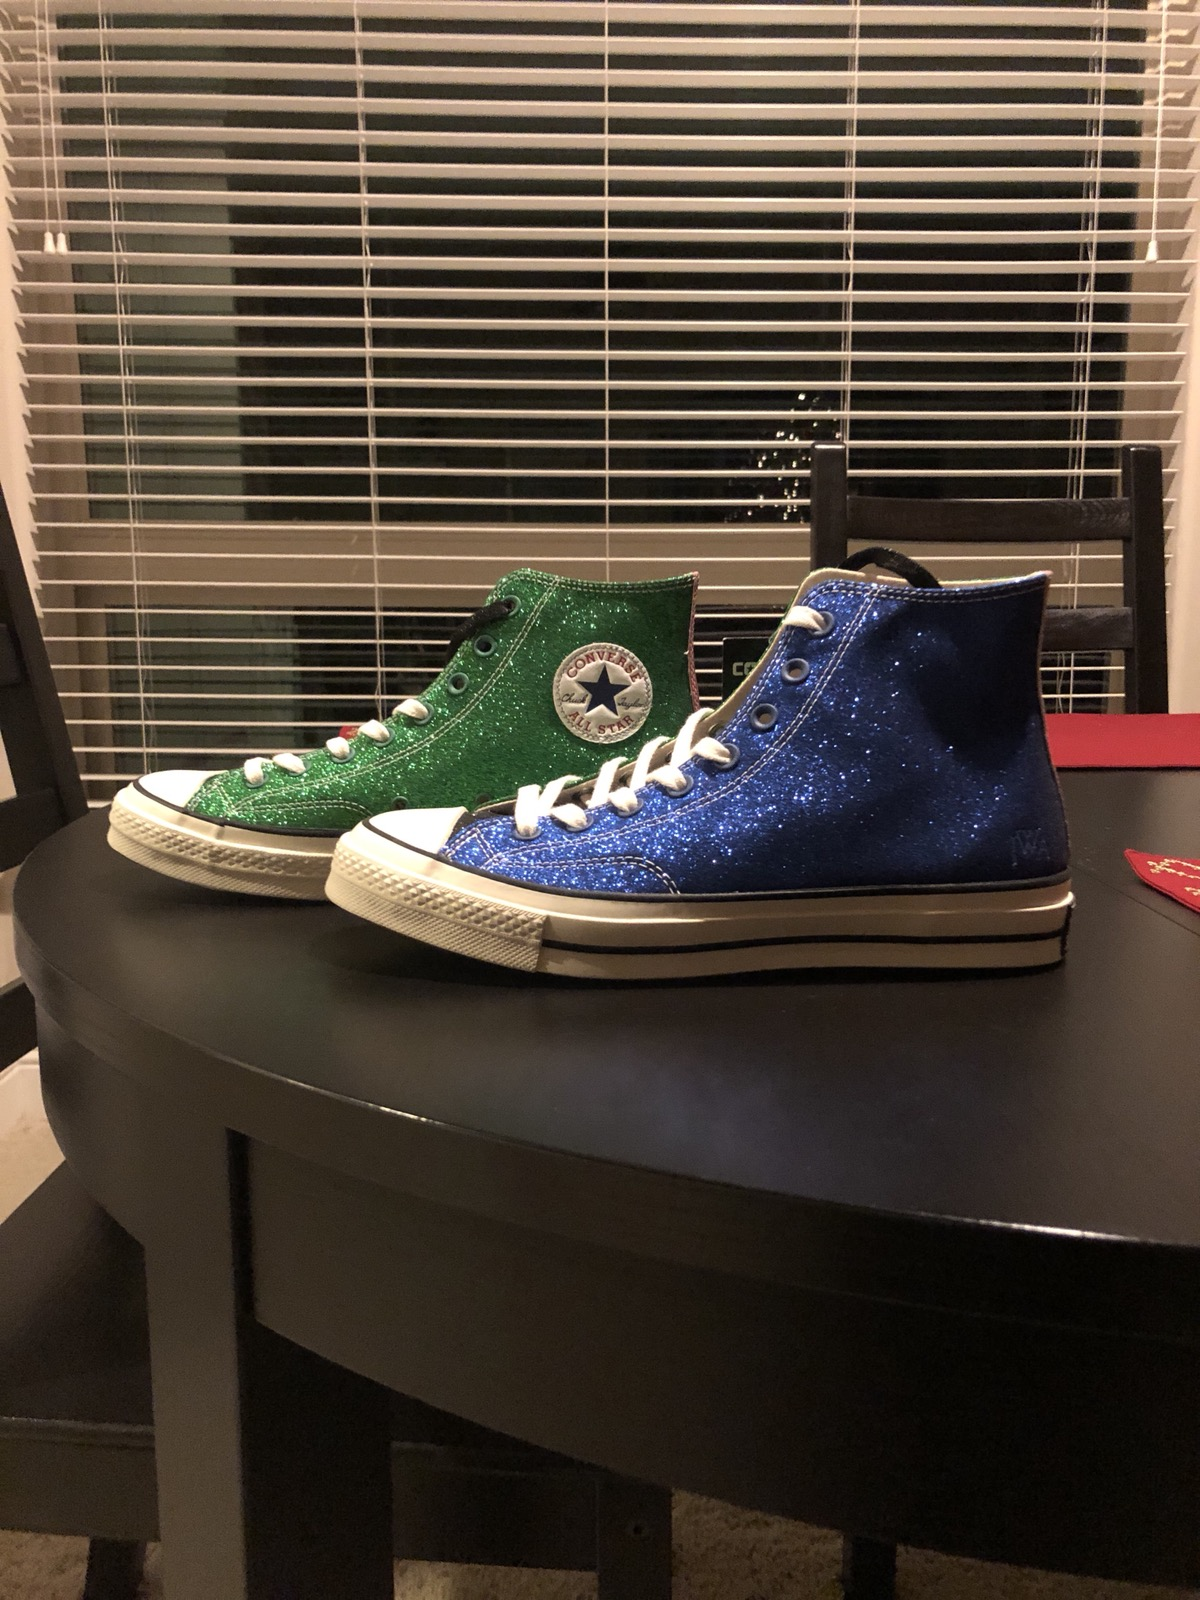 39423ad37e248f Converse Converse Chuck Taylor All Star 70s Jw Anderson Glitter Blue green Black  Size 9.5 - Hi-Top Sneakers for Sale - Grailed